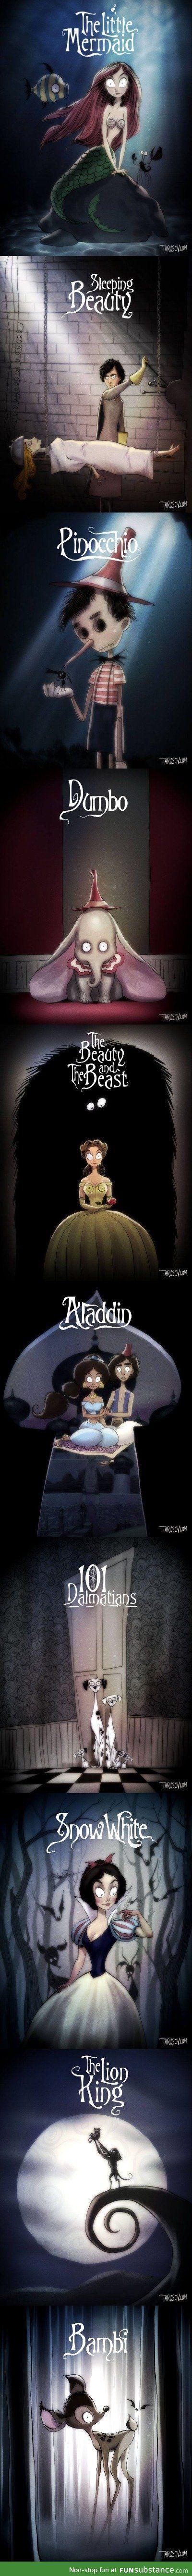 Tim Burton style Disney posters